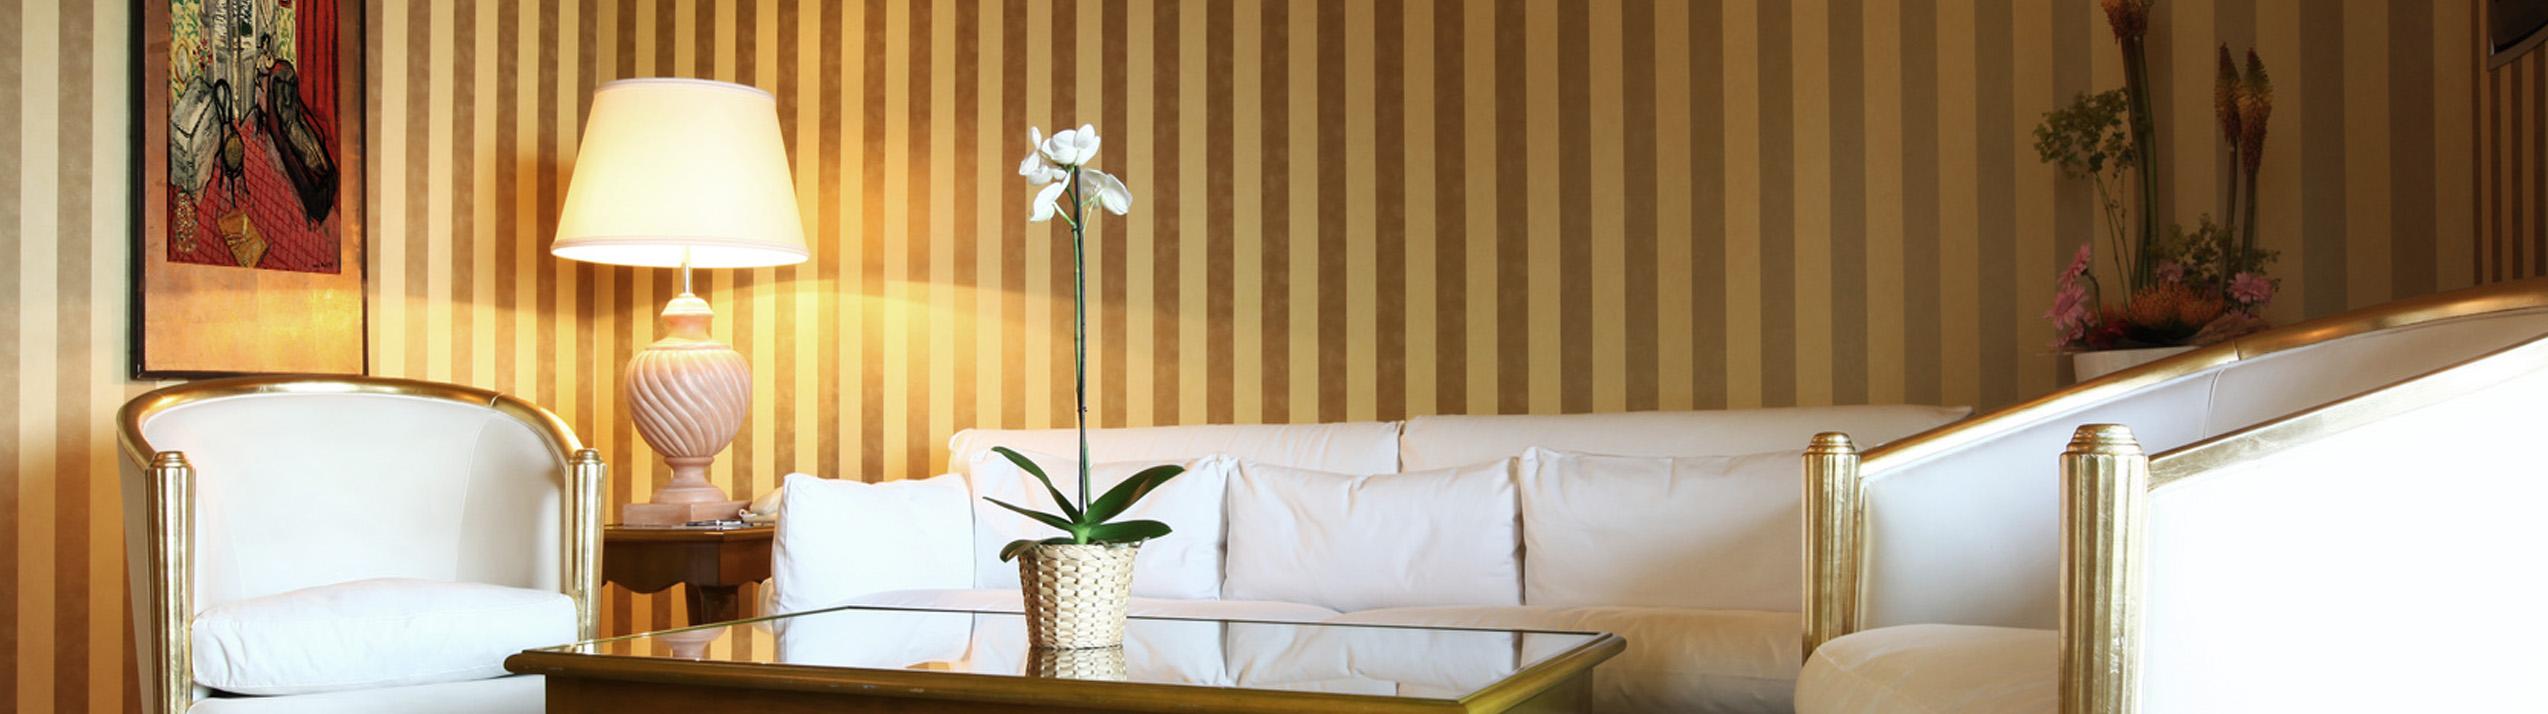 ariane kalfa votre psy en ligne par t l phone ou par mail. Black Bedroom Furniture Sets. Home Design Ideas